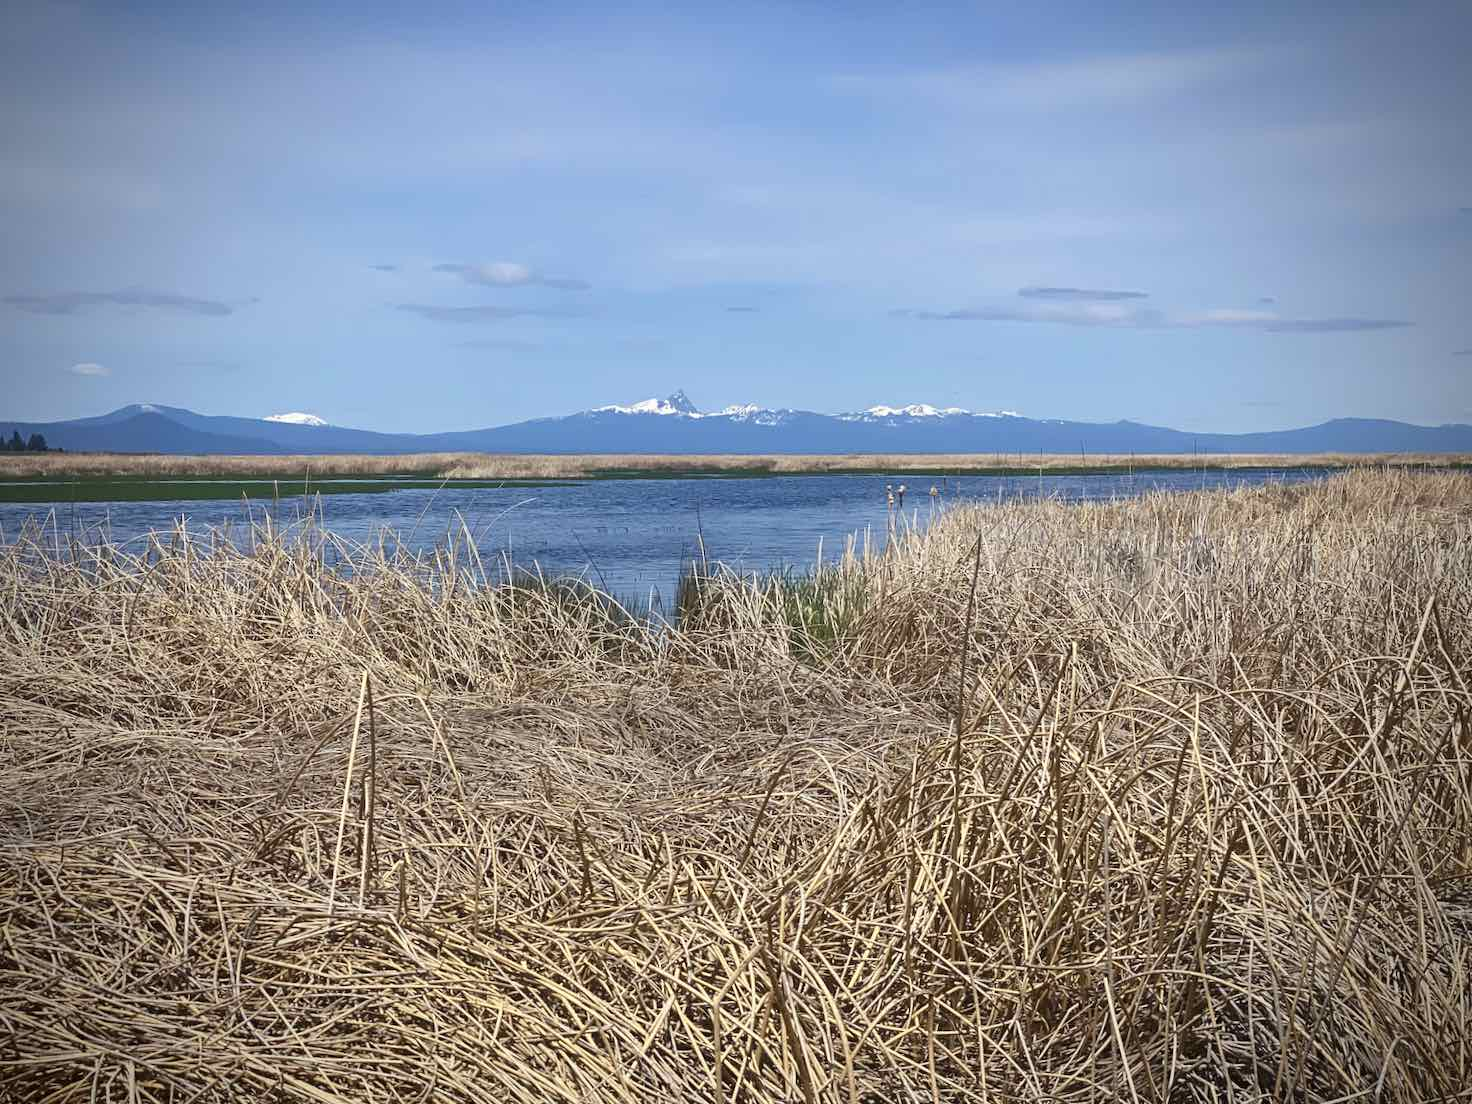 View of Mt Scott across Wocus Bay in Klamath Marsh.